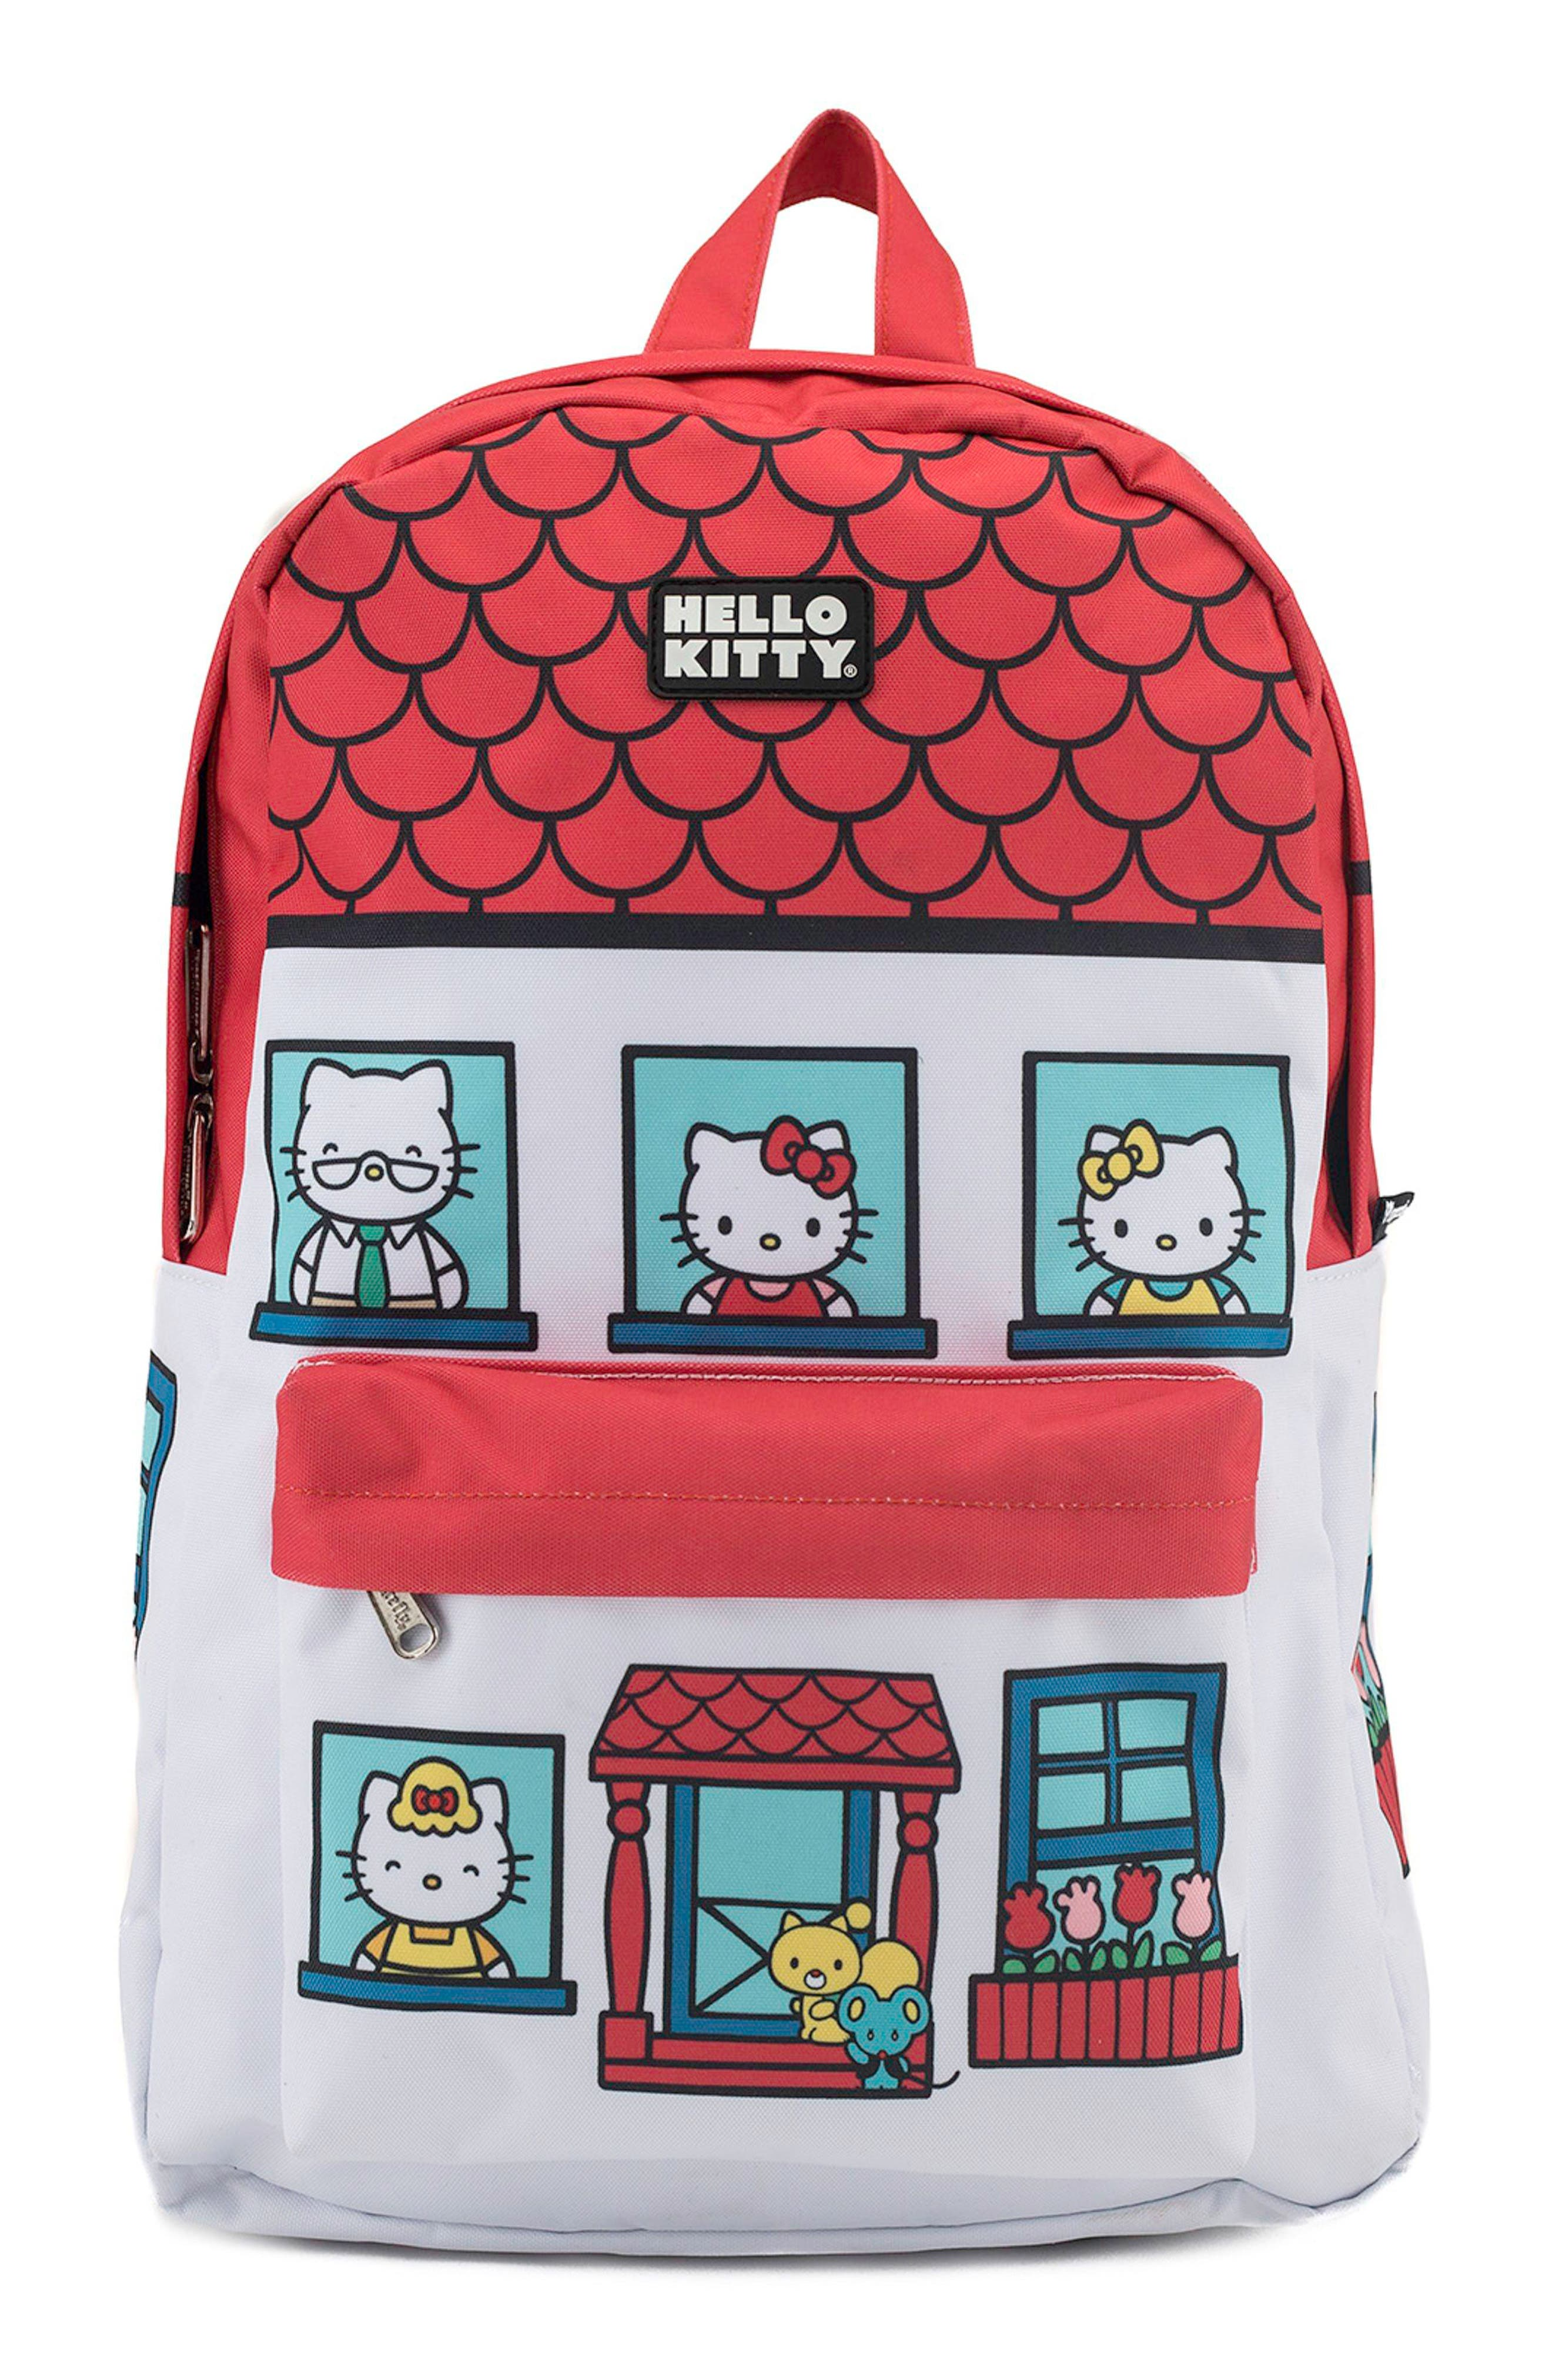 x Hello Kitty House Backpack,                             Main thumbnail 1, color,